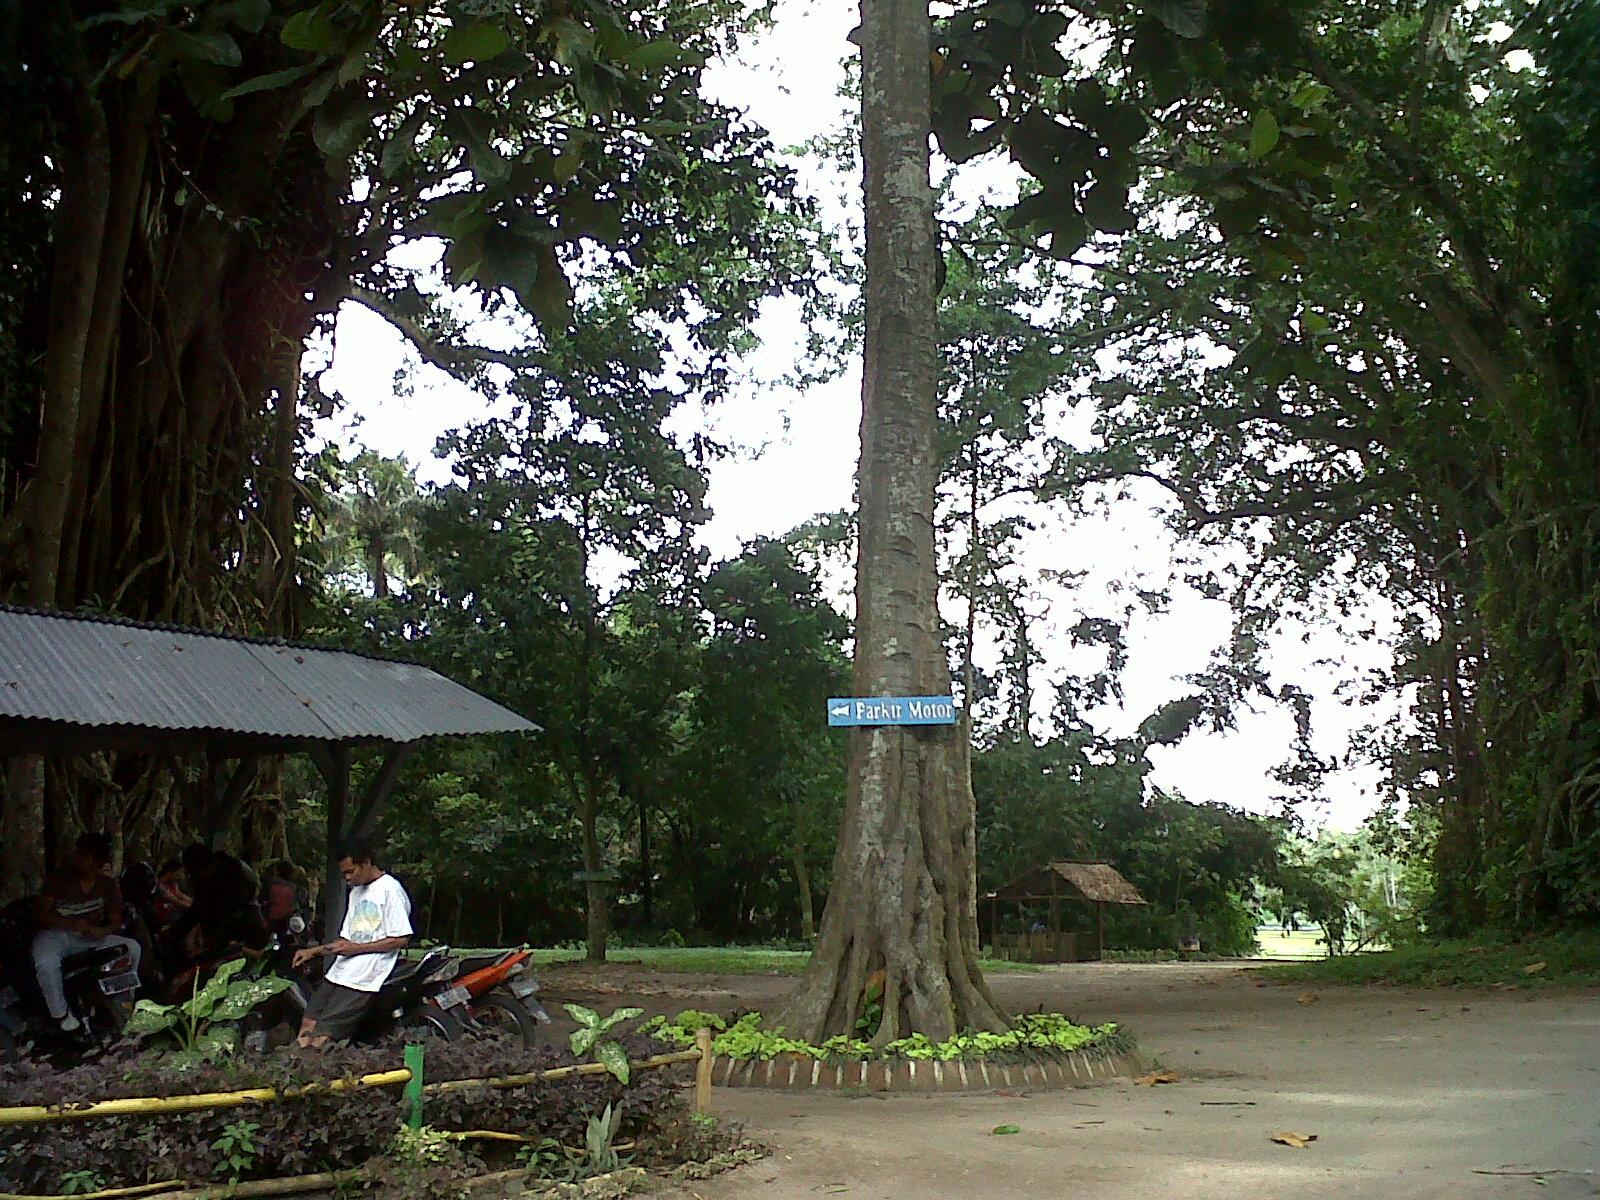 Hidup Sukses Wisata Waduk Danau Paco Nglegok Blitar Jawa